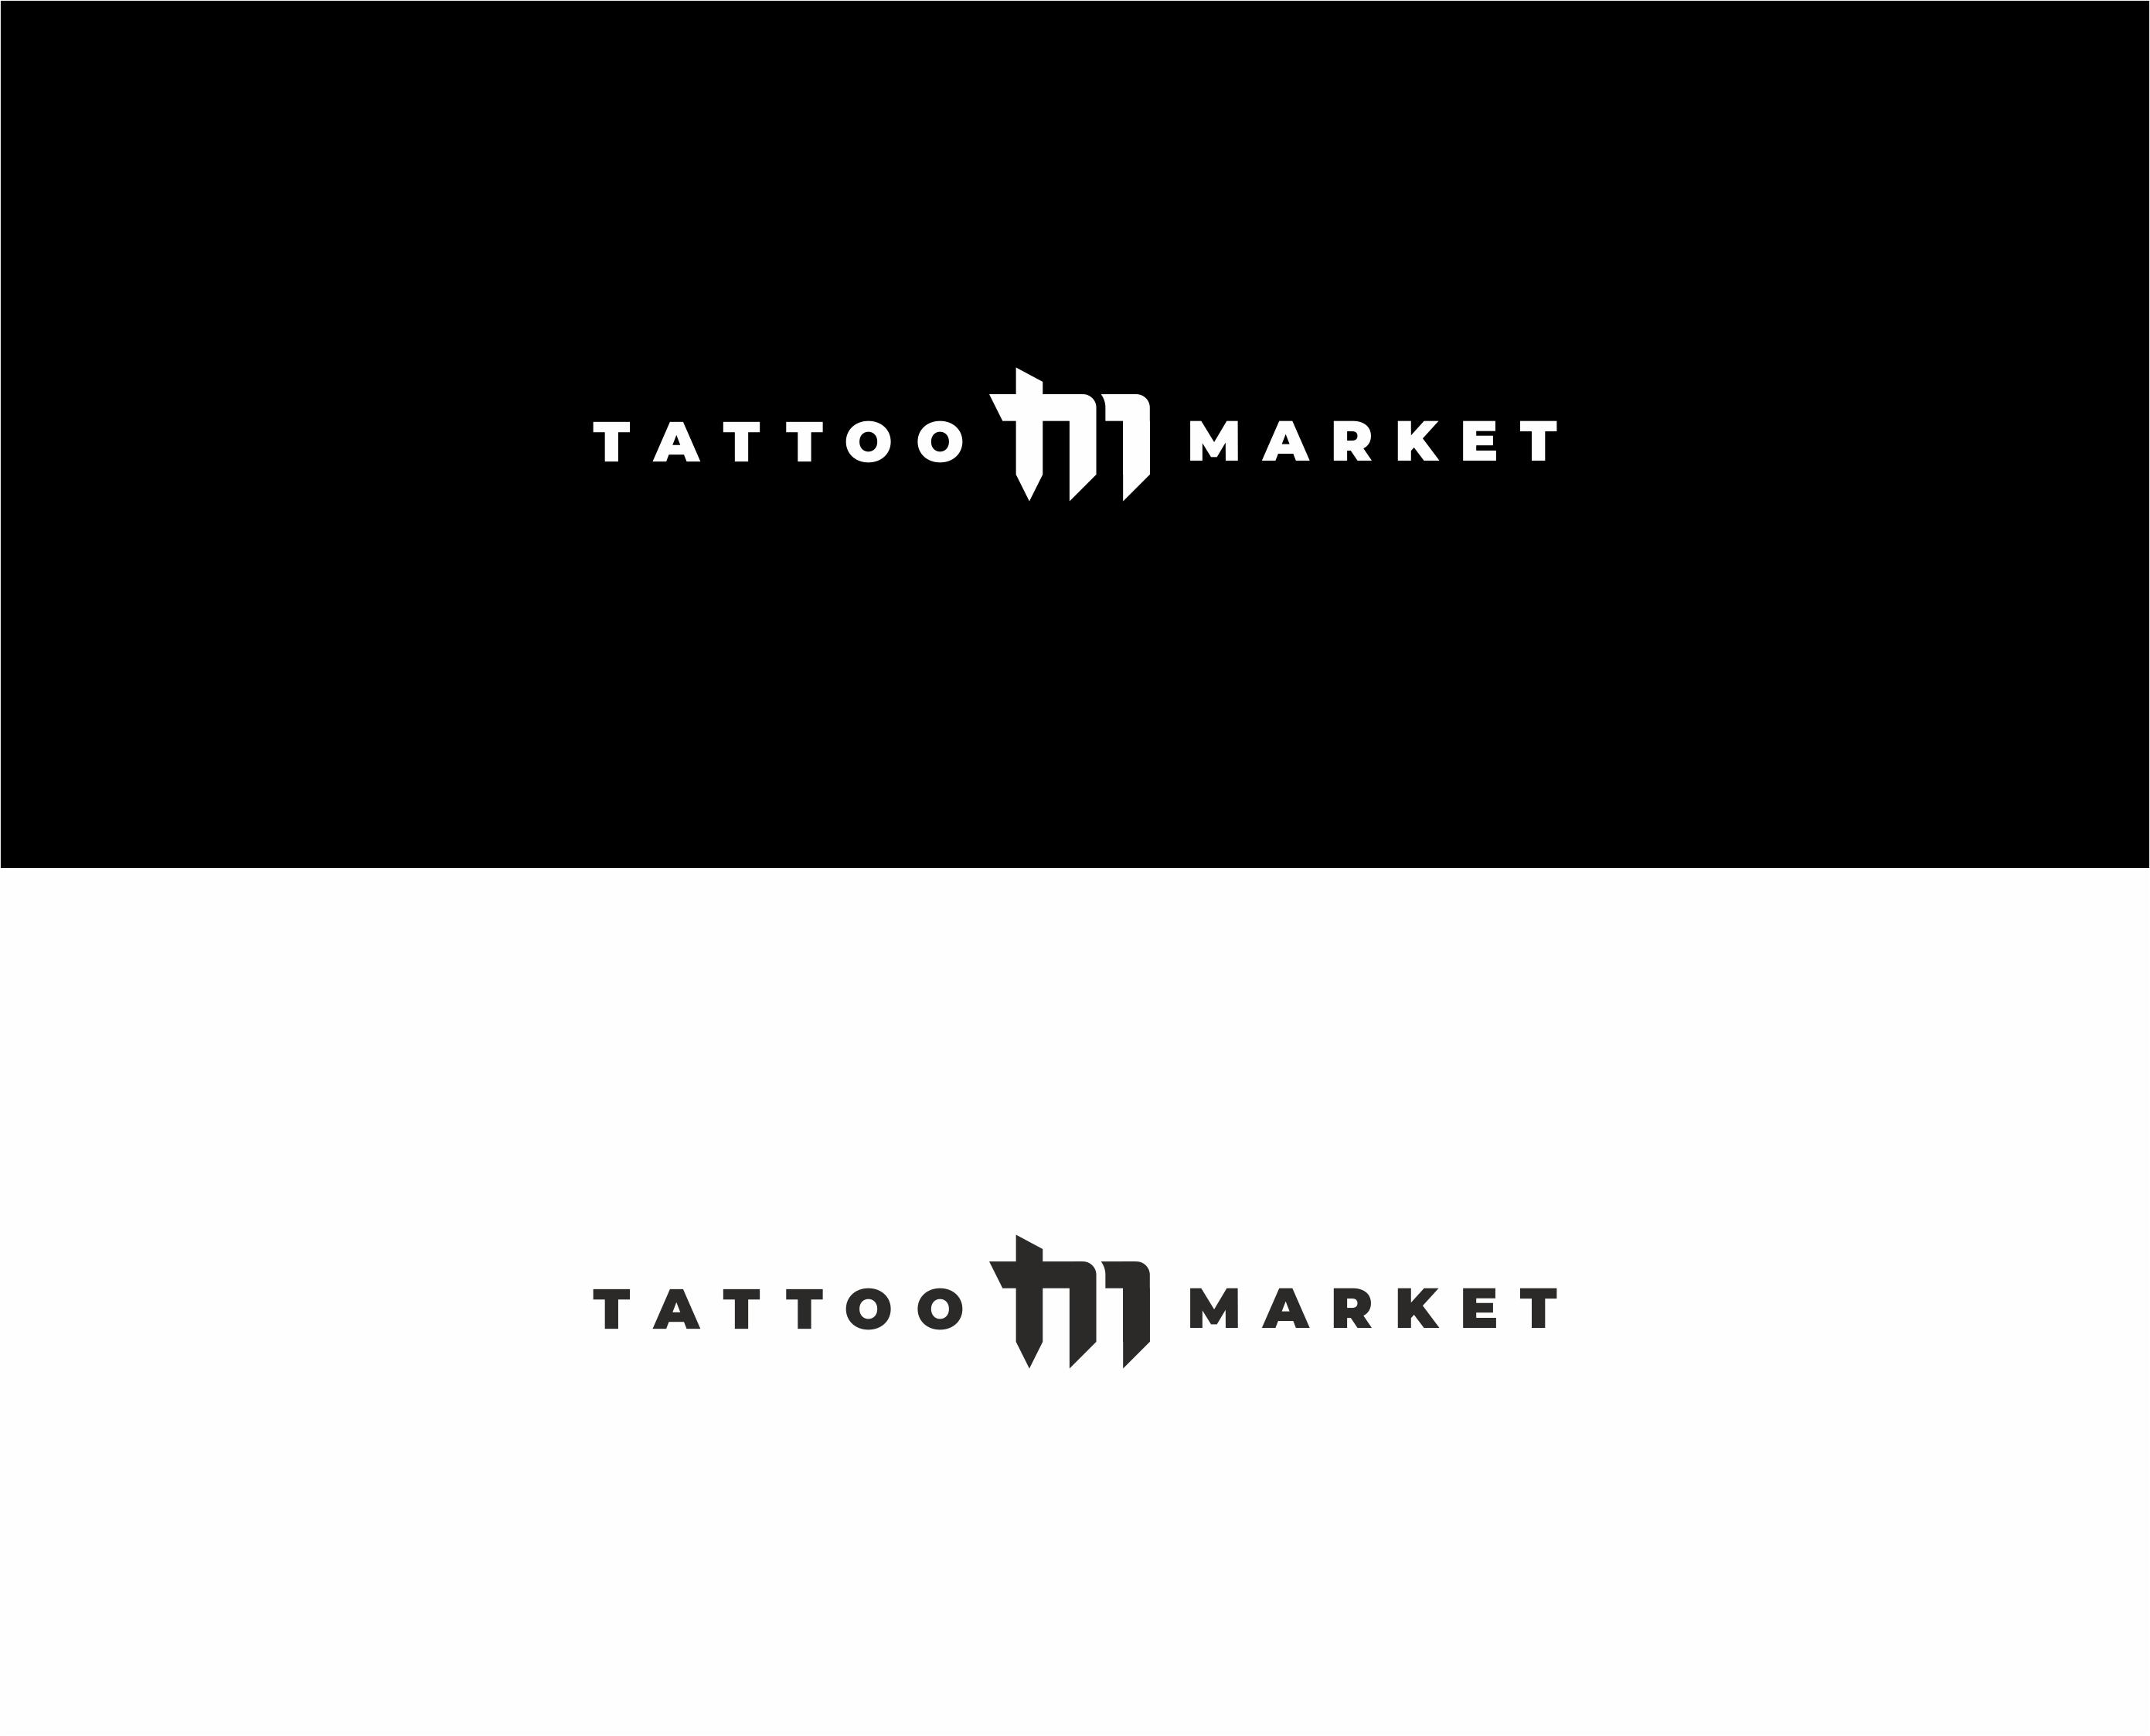 Редизайн логотипа магазина тату оборудования TattooMarket.ru фото f_4195c3edfb6bc890.jpg